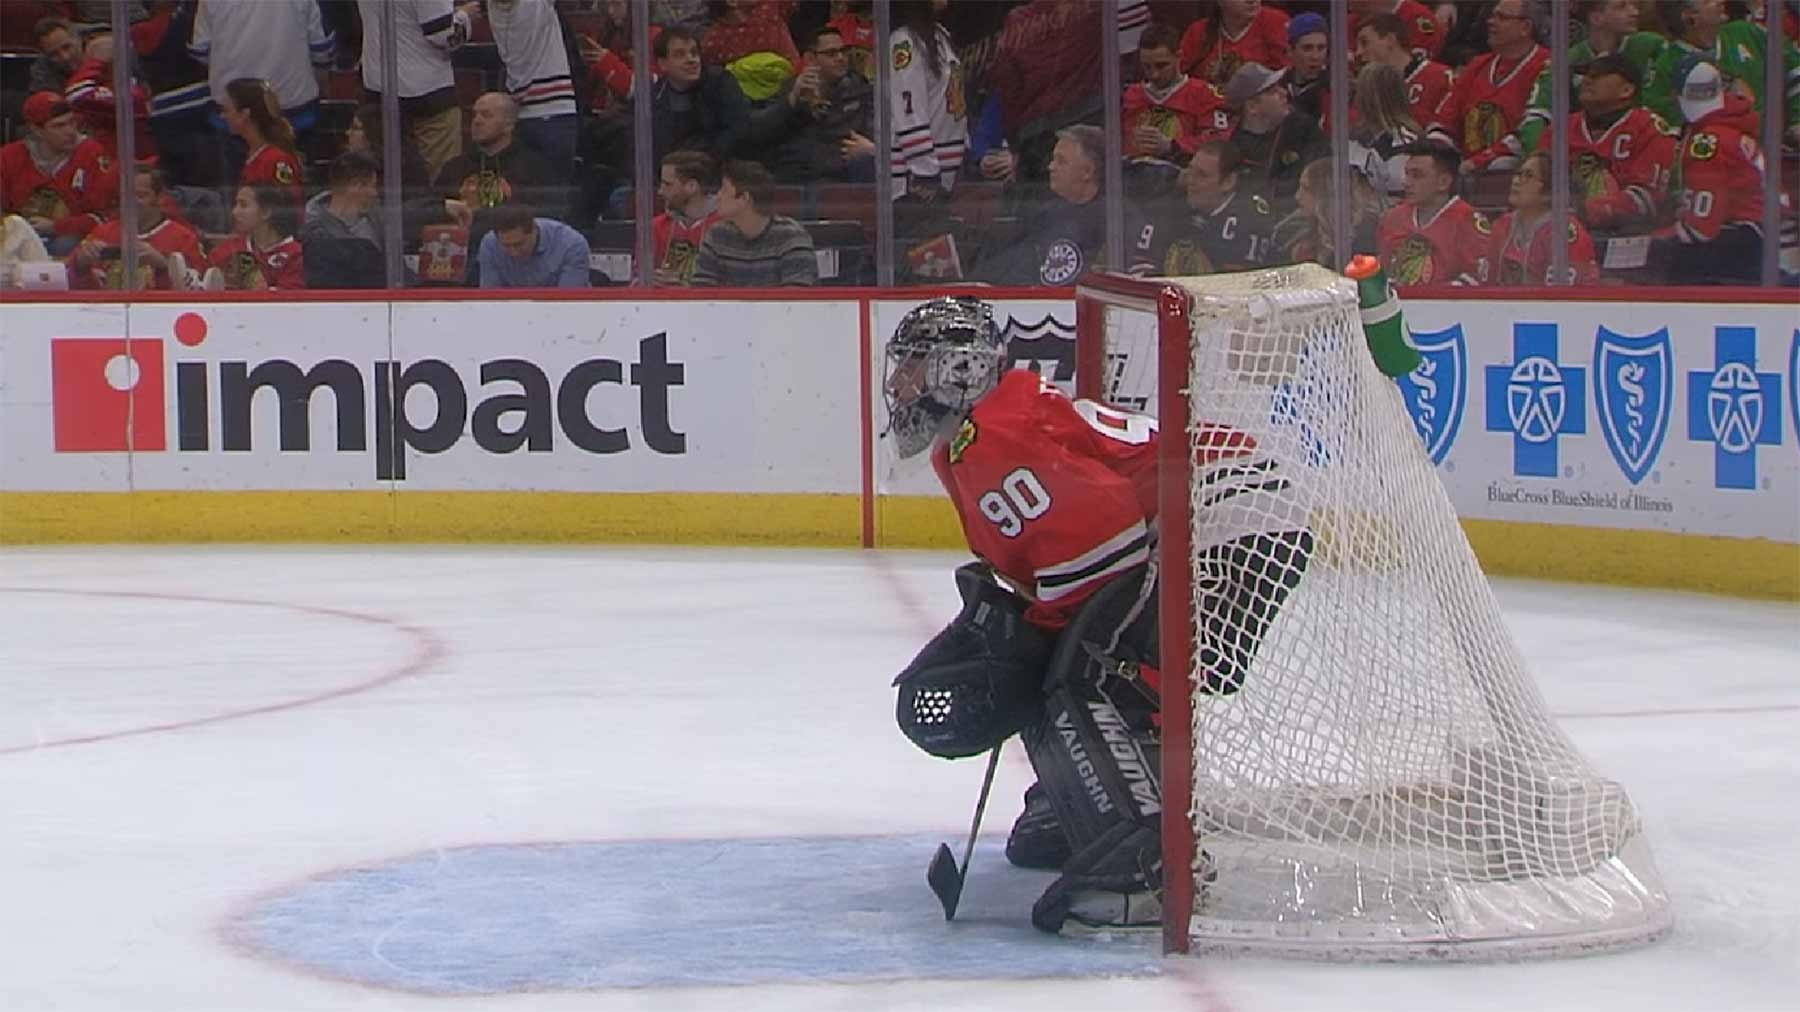 36-jähriger Notfalltorwart spielt sensationelle NHL-Partie